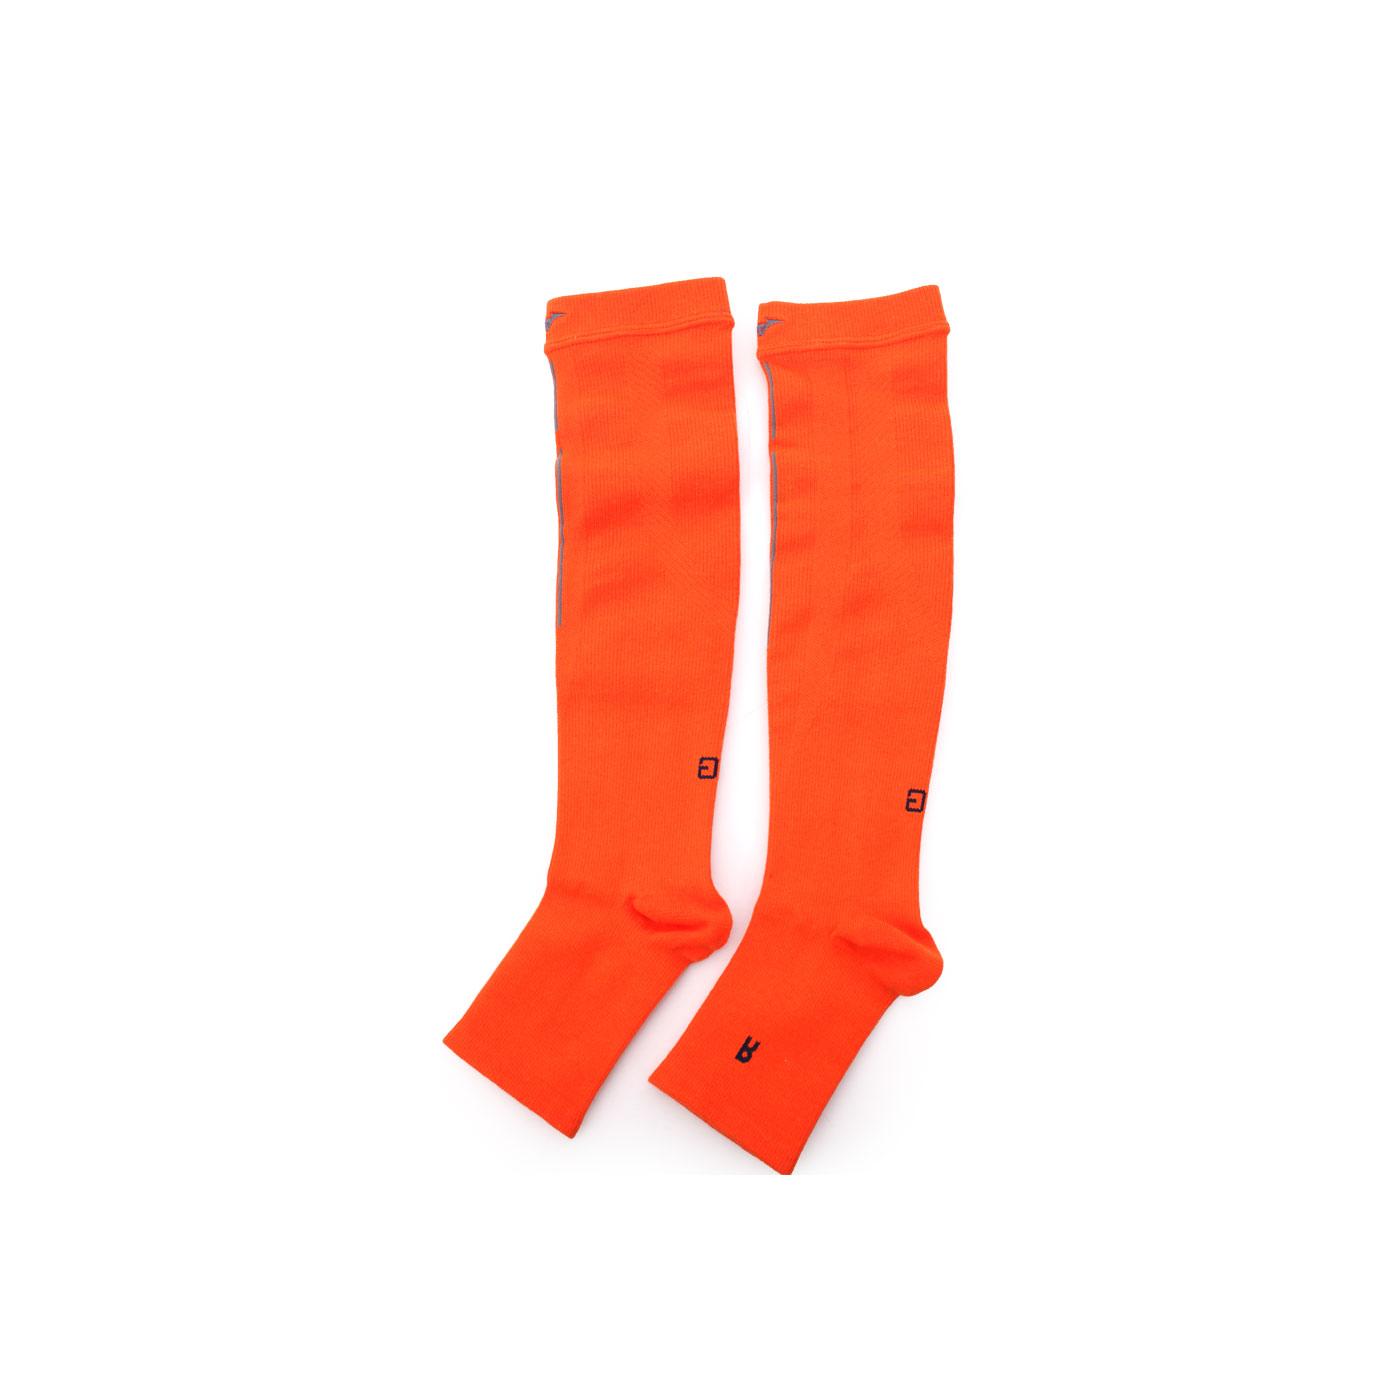 MIZUNO 日製-BG 襪套 K2JJ4A5009 - 橘